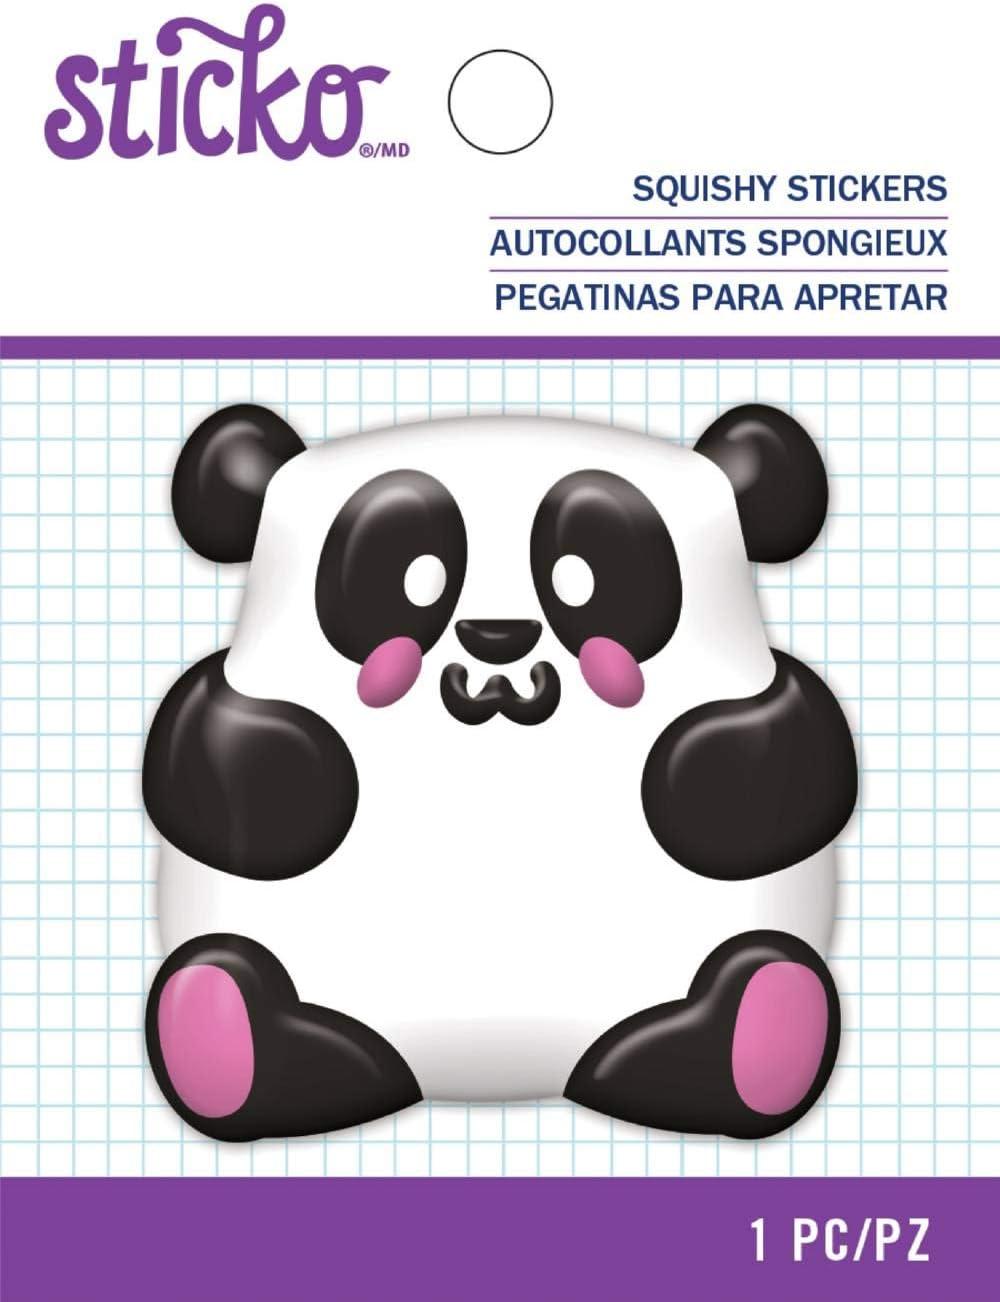 Sticko Squishy-Panda 52-45059 Other